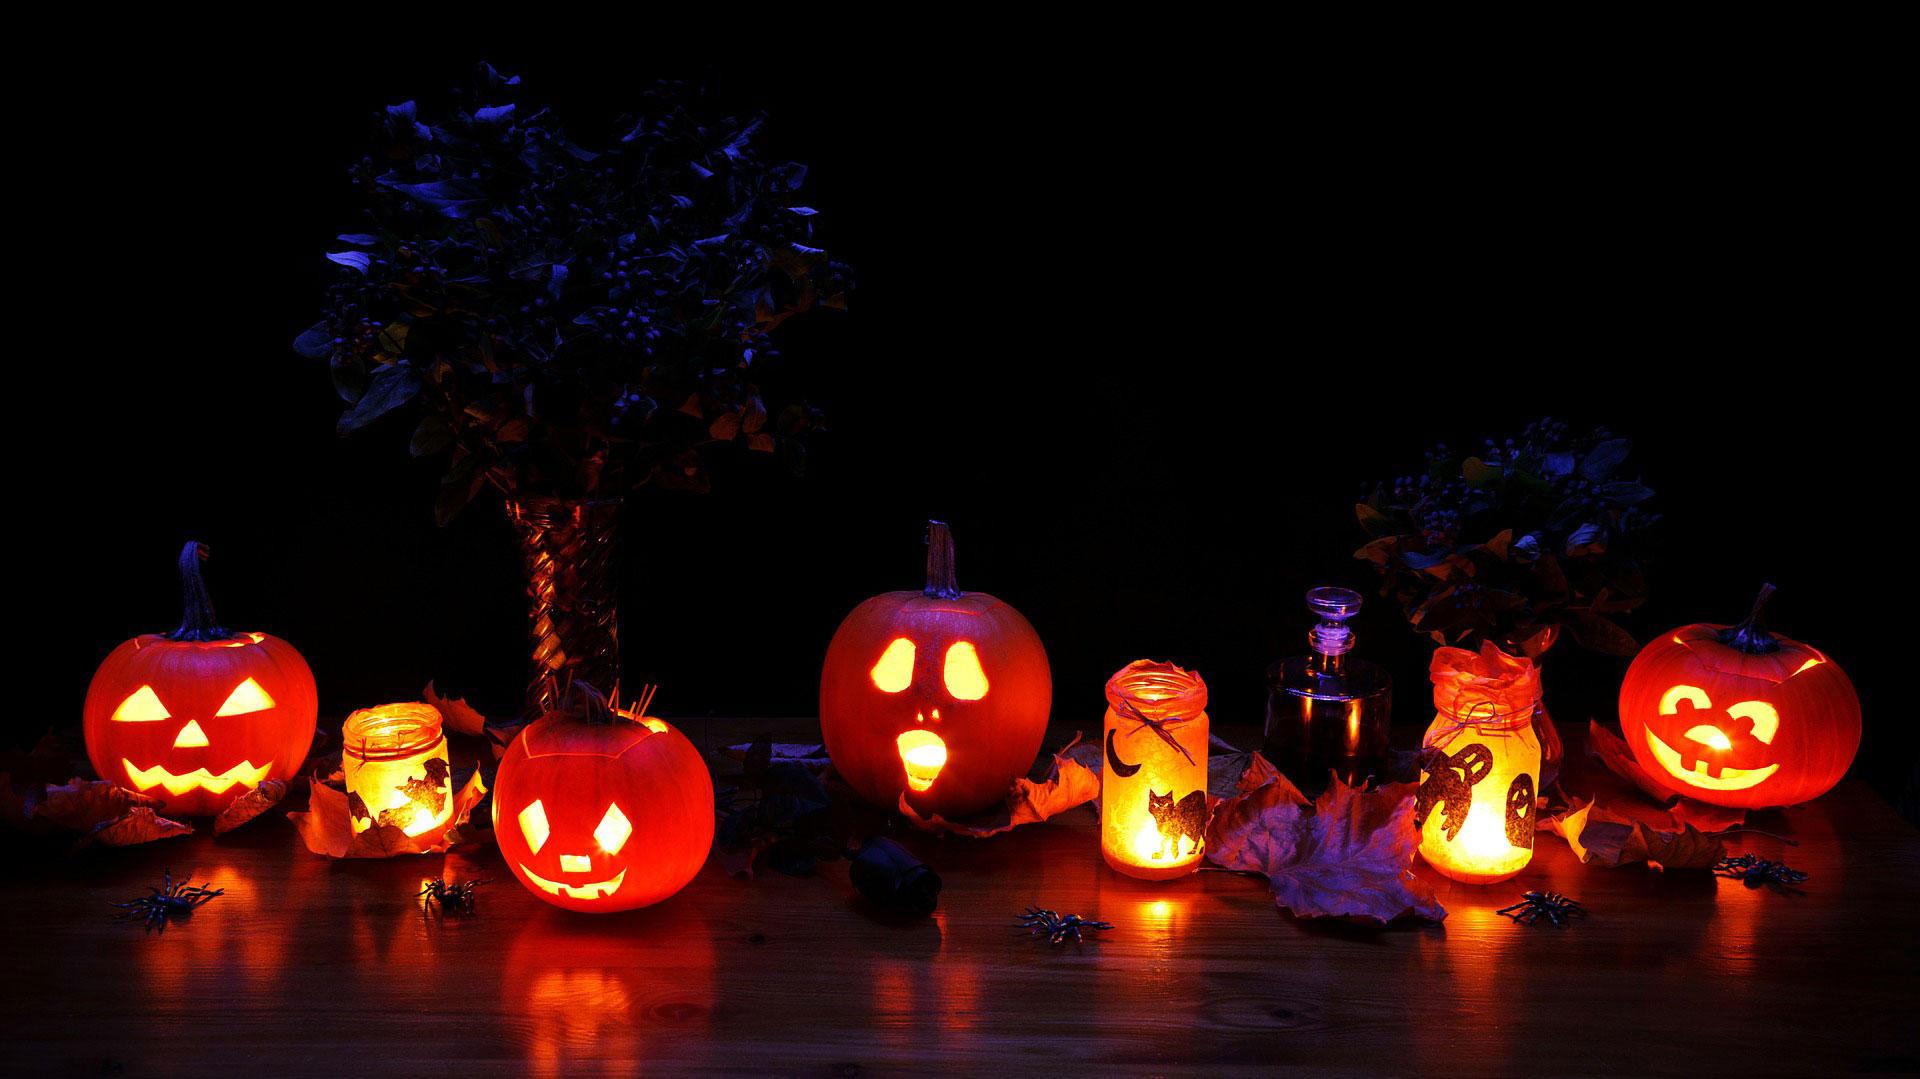 Halloween Verlichting.Foto Halloween Verlichting Afb 28903 Images